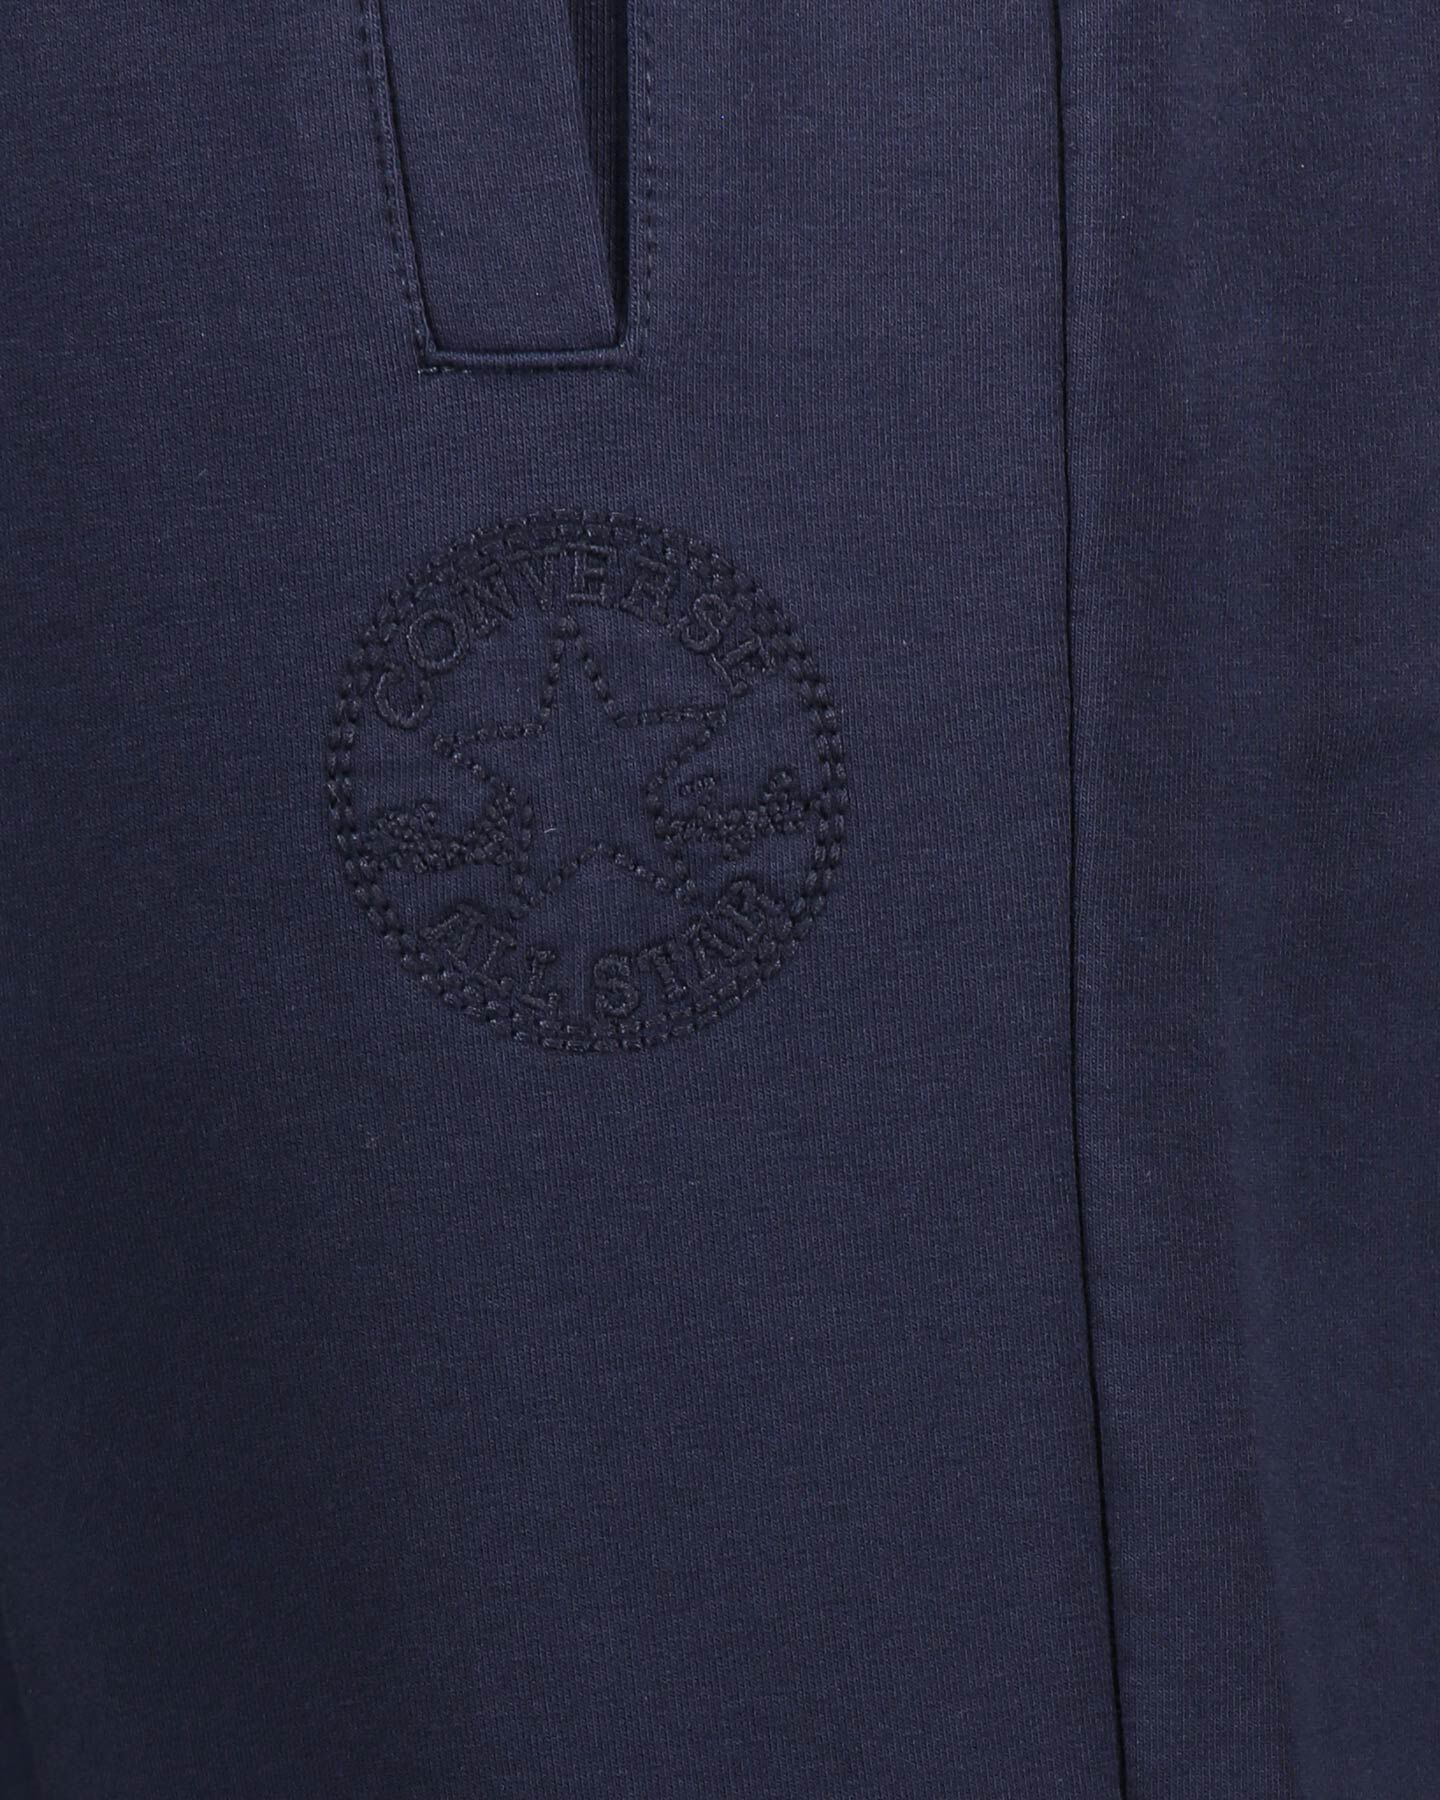 Pantalone CONVERSE CLASSIC PATCH M S5181084 scatto 3